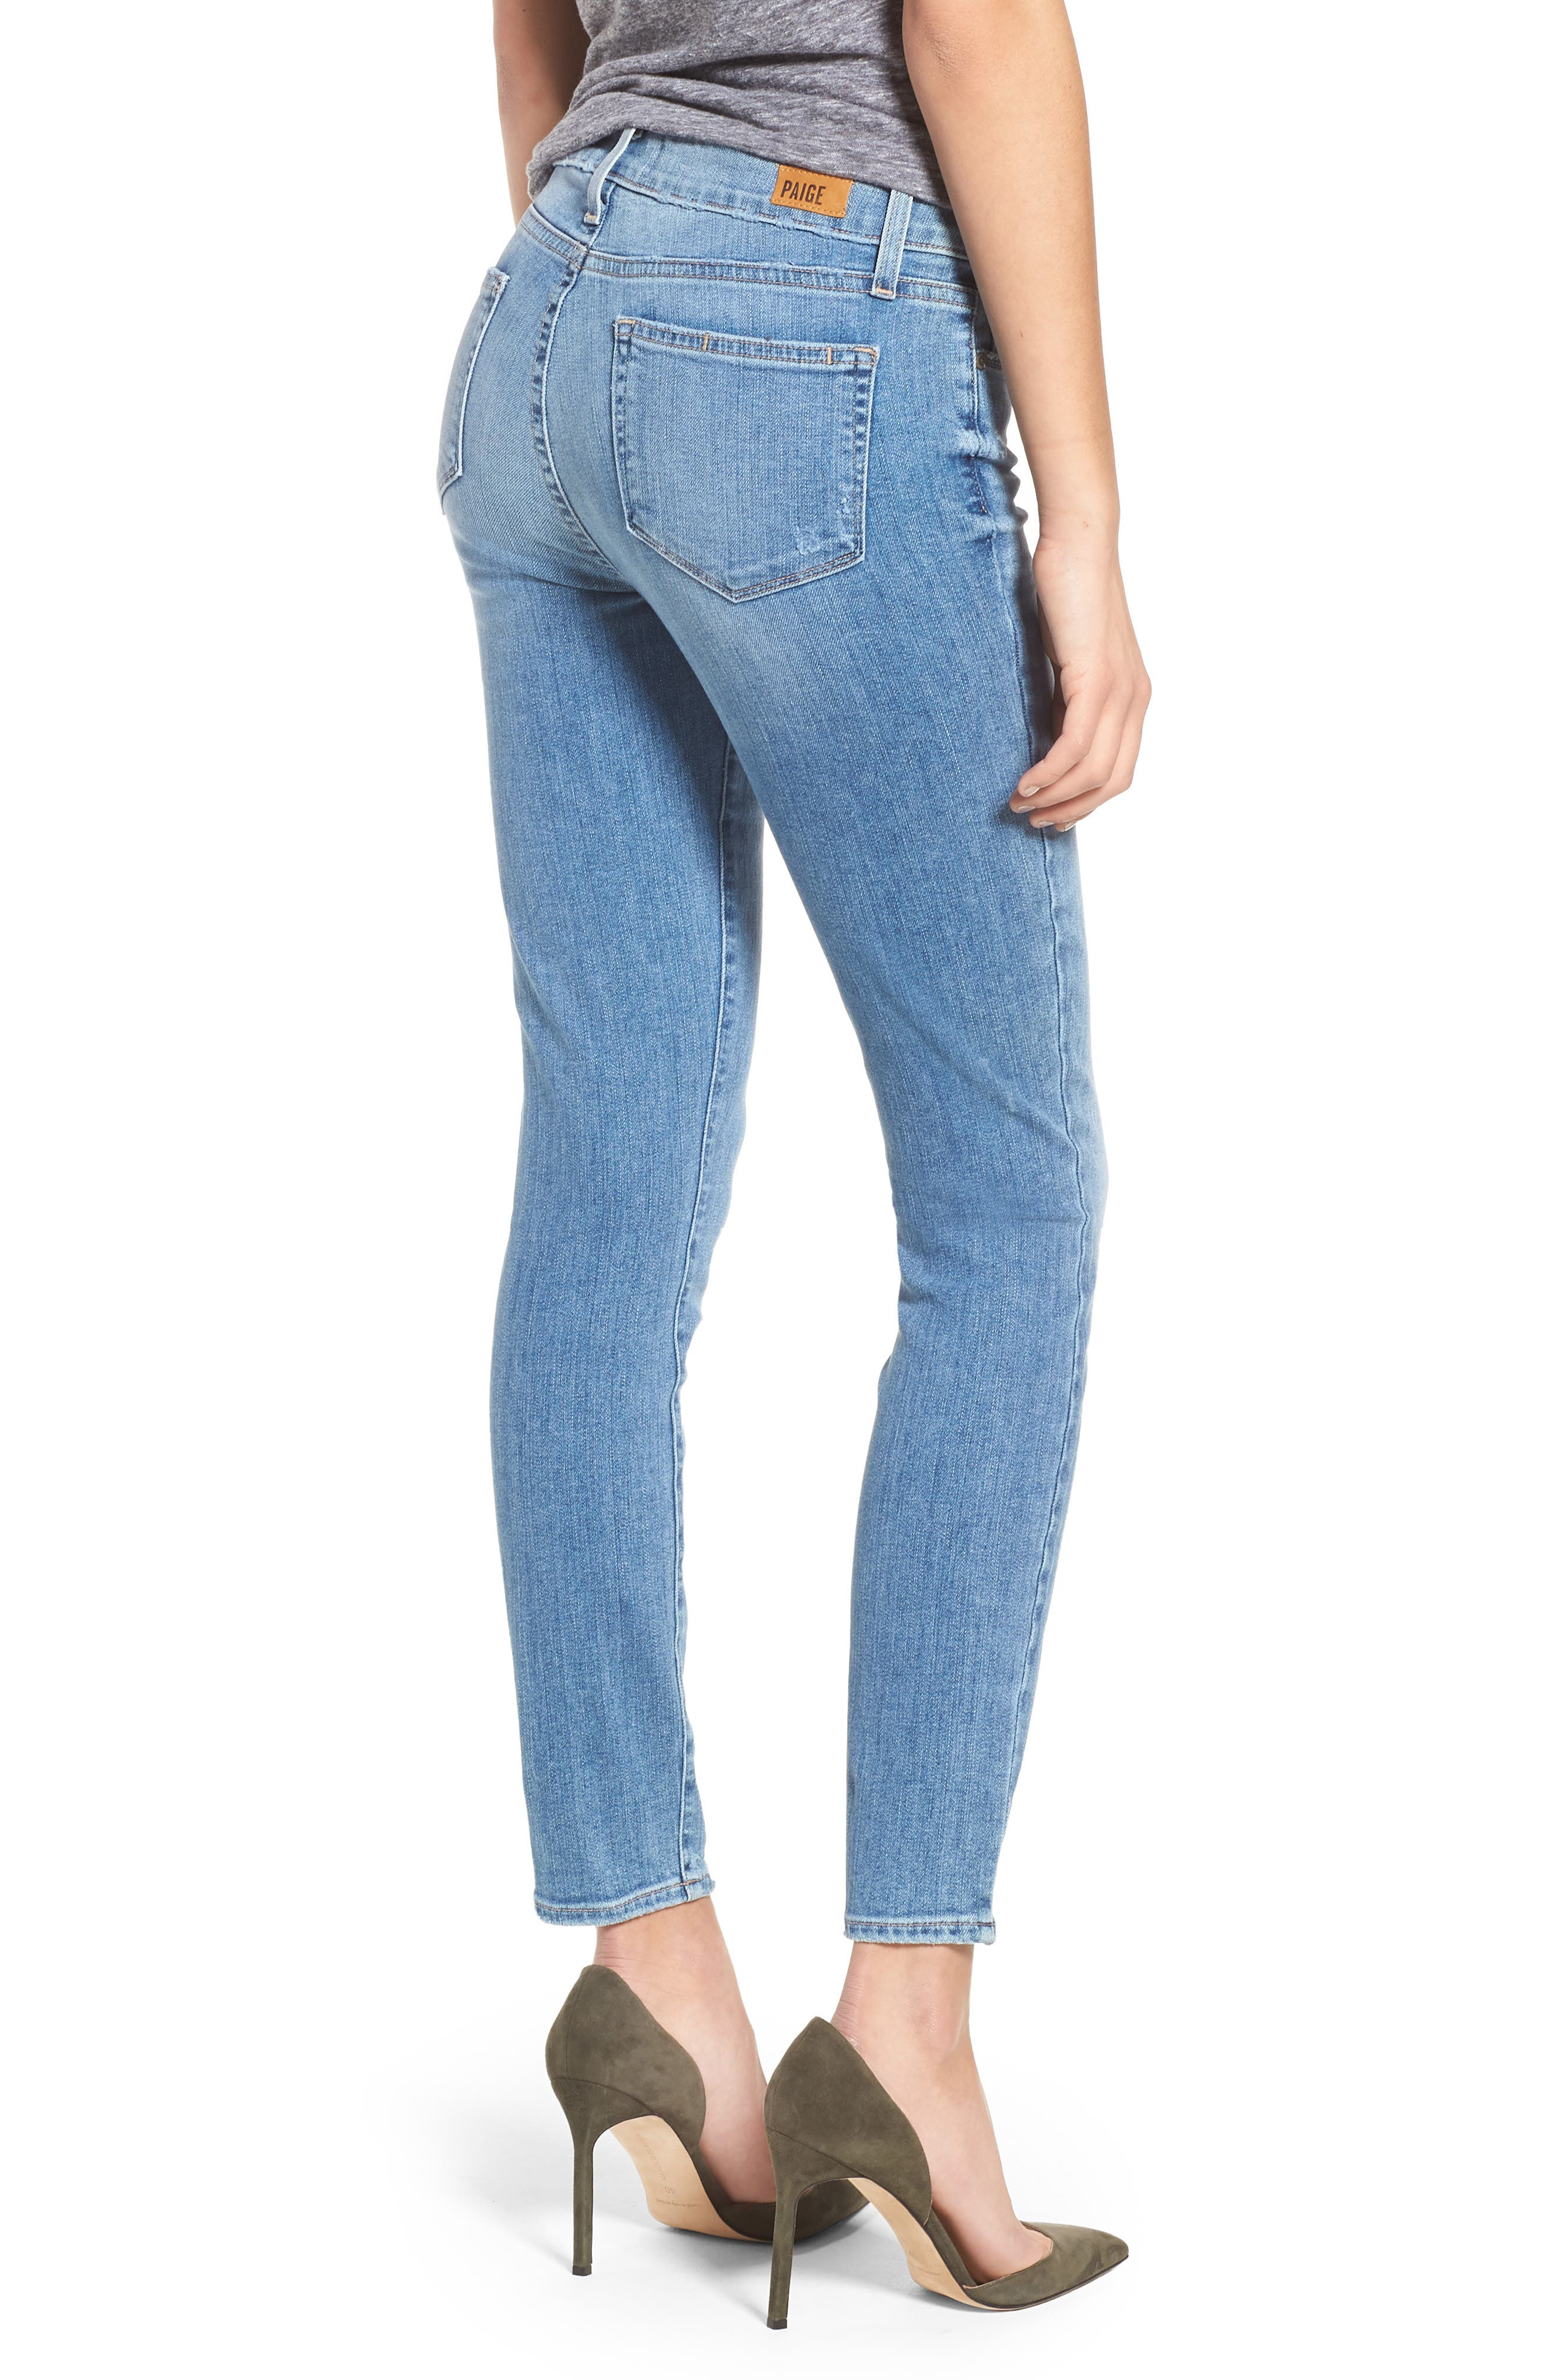 Transcend - Verdugo Ankle Ultra Skinny Jeans,                             Alternate thumbnail 2, color,                             400